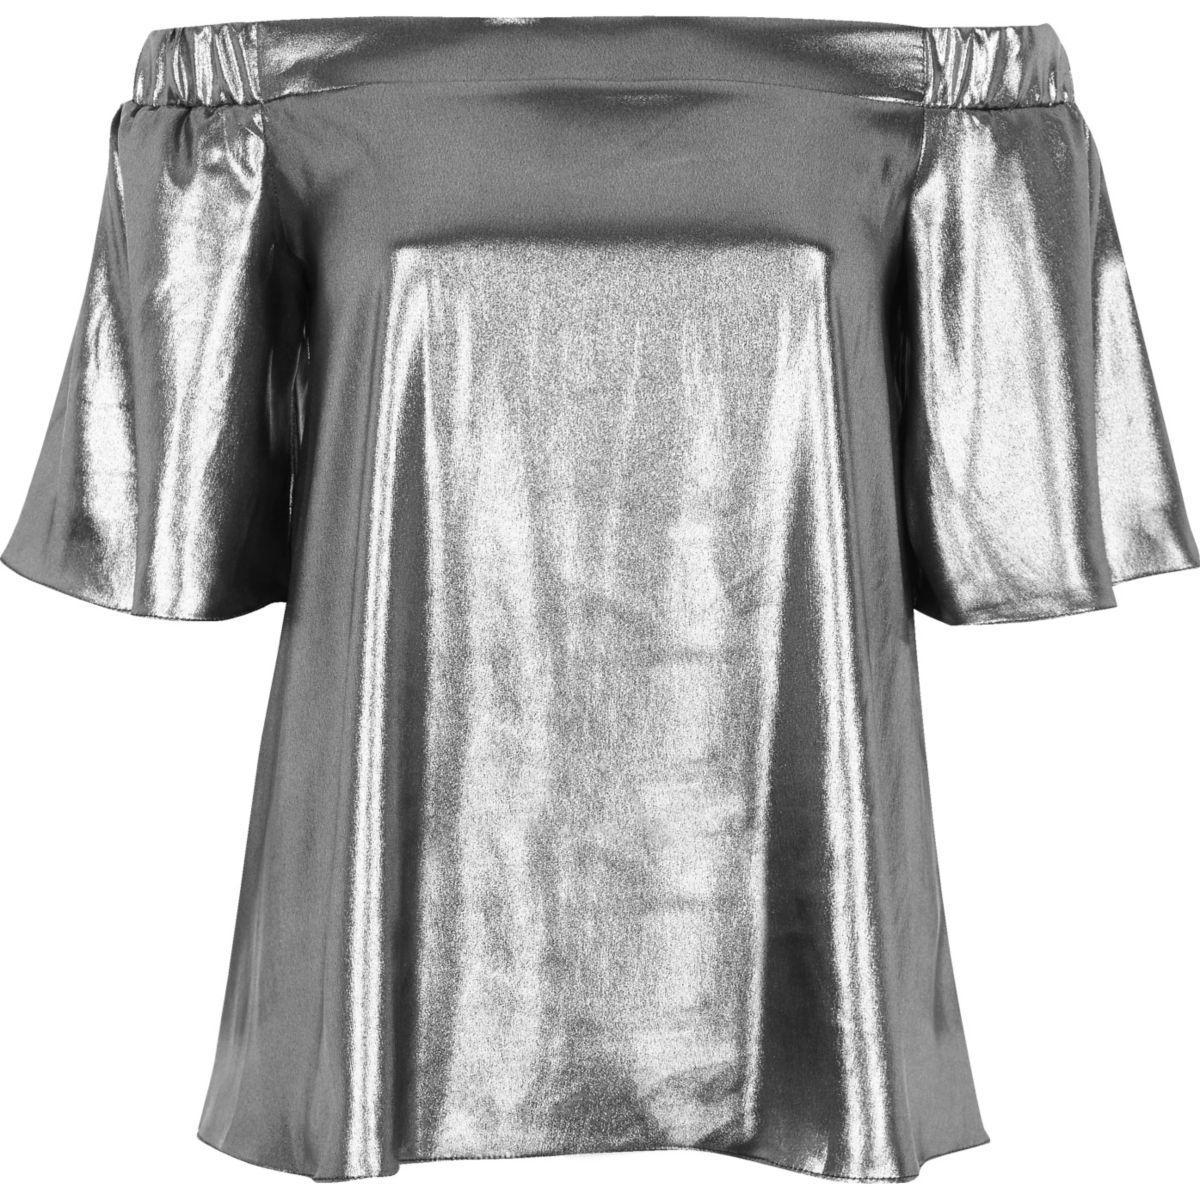 93f952f6b27ec Lyst - River Island Silver Metallic Bardot Top in Gray